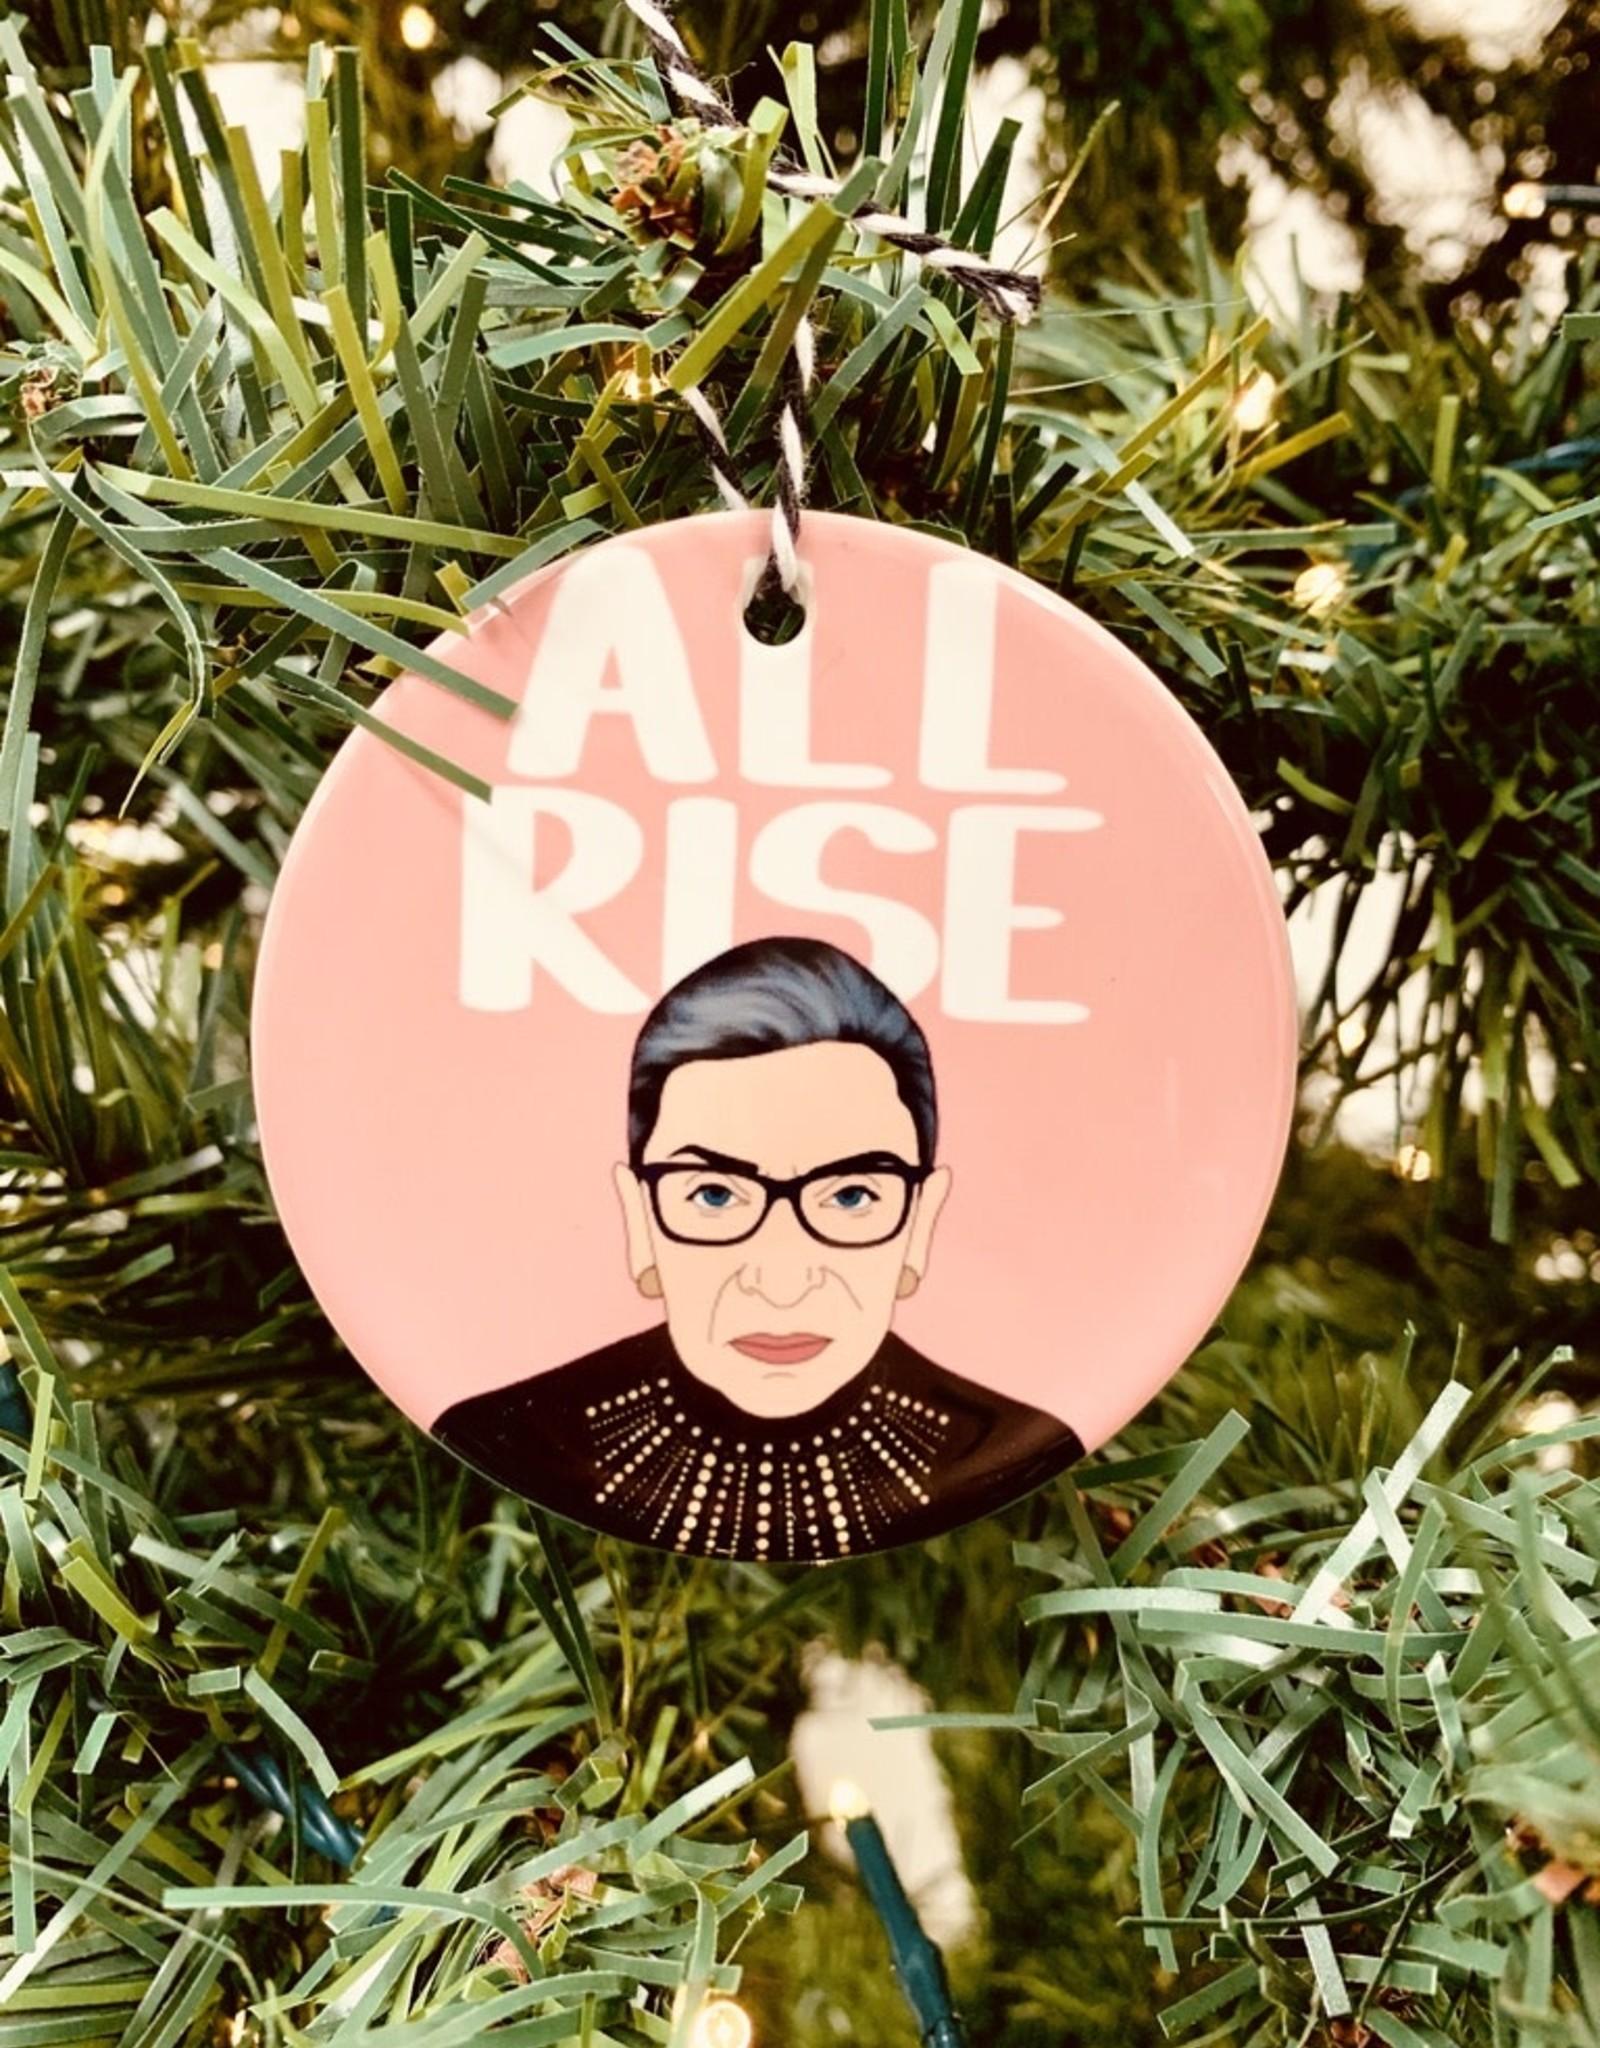 RBG All Rise Ornament